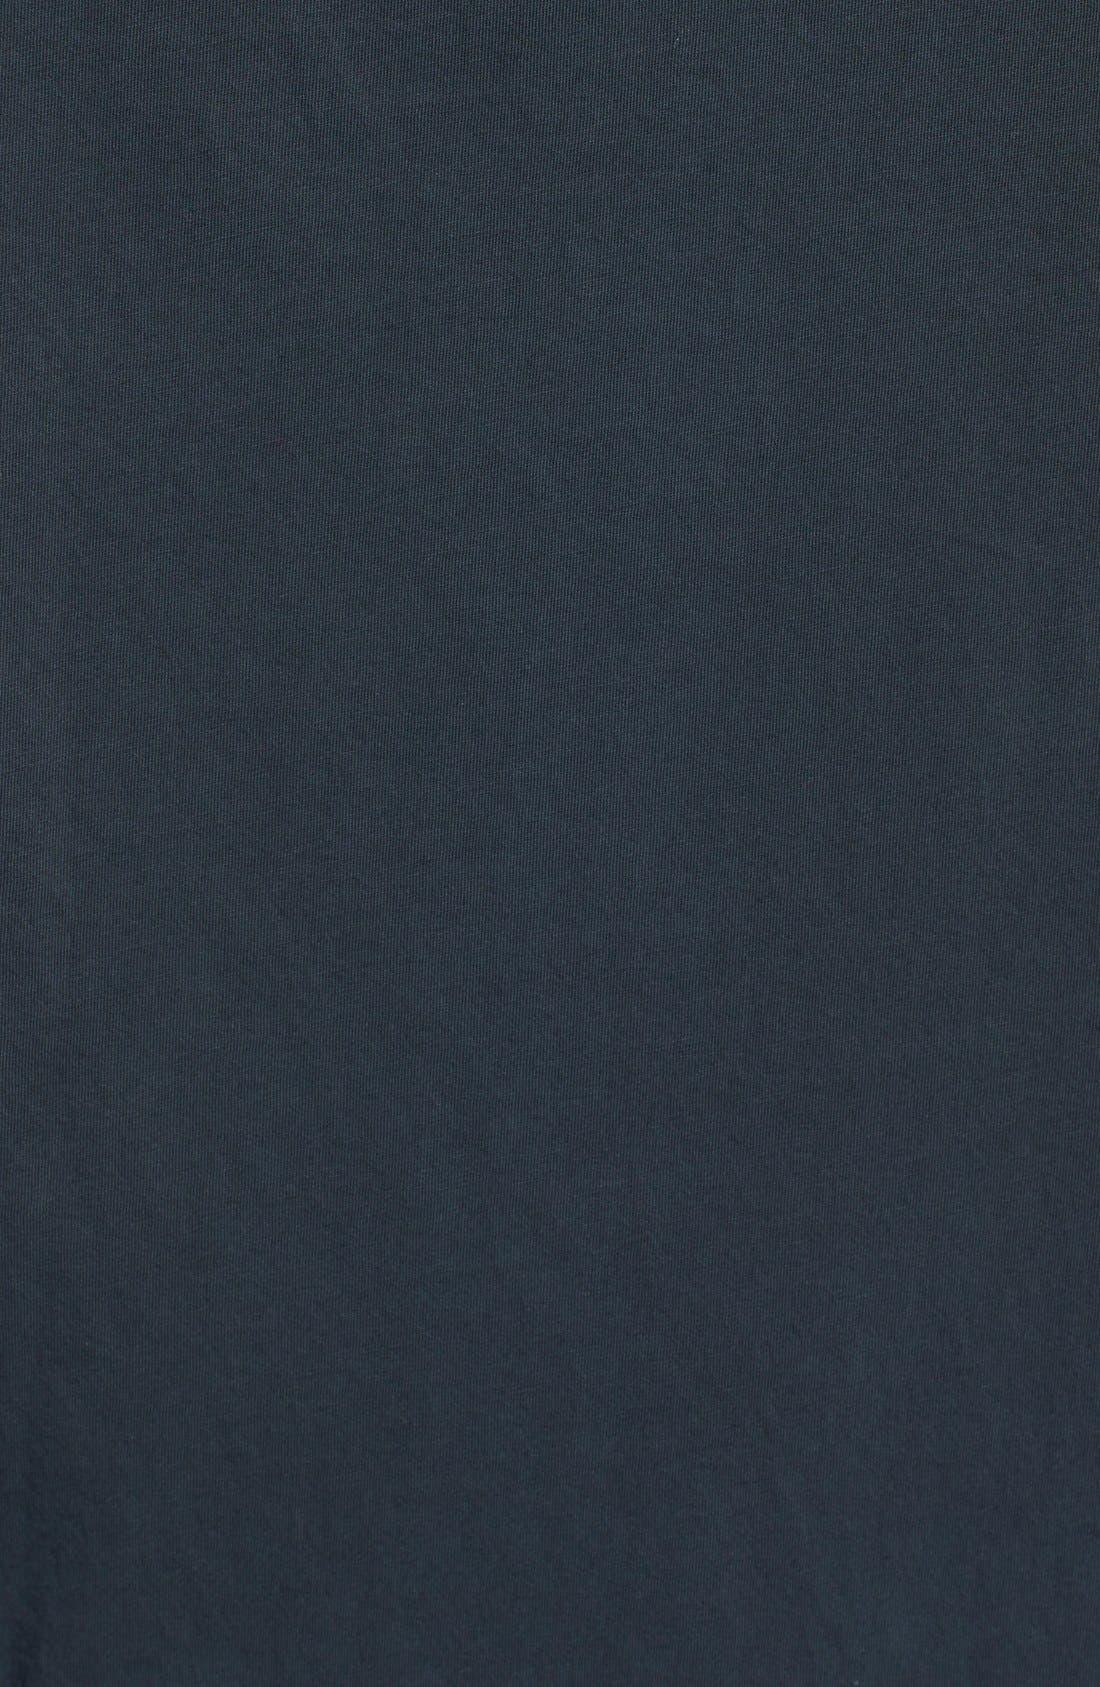 Alternate Image 3  - Scott Free 'Fired Up' Graphic V-Neck T-Shirt